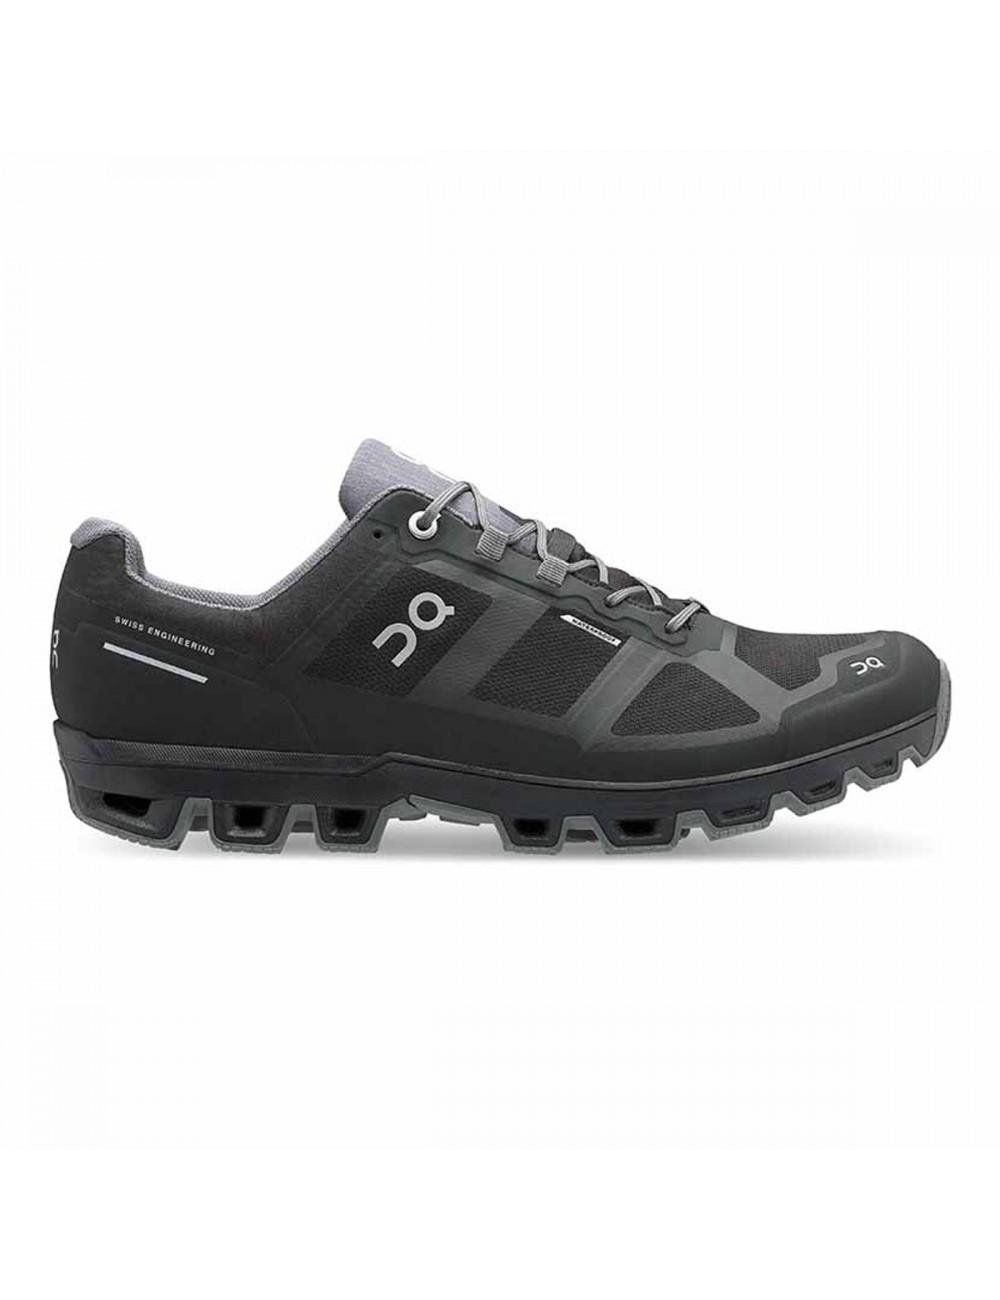 ON Cloudventure Waterproof Shoe 1_13570